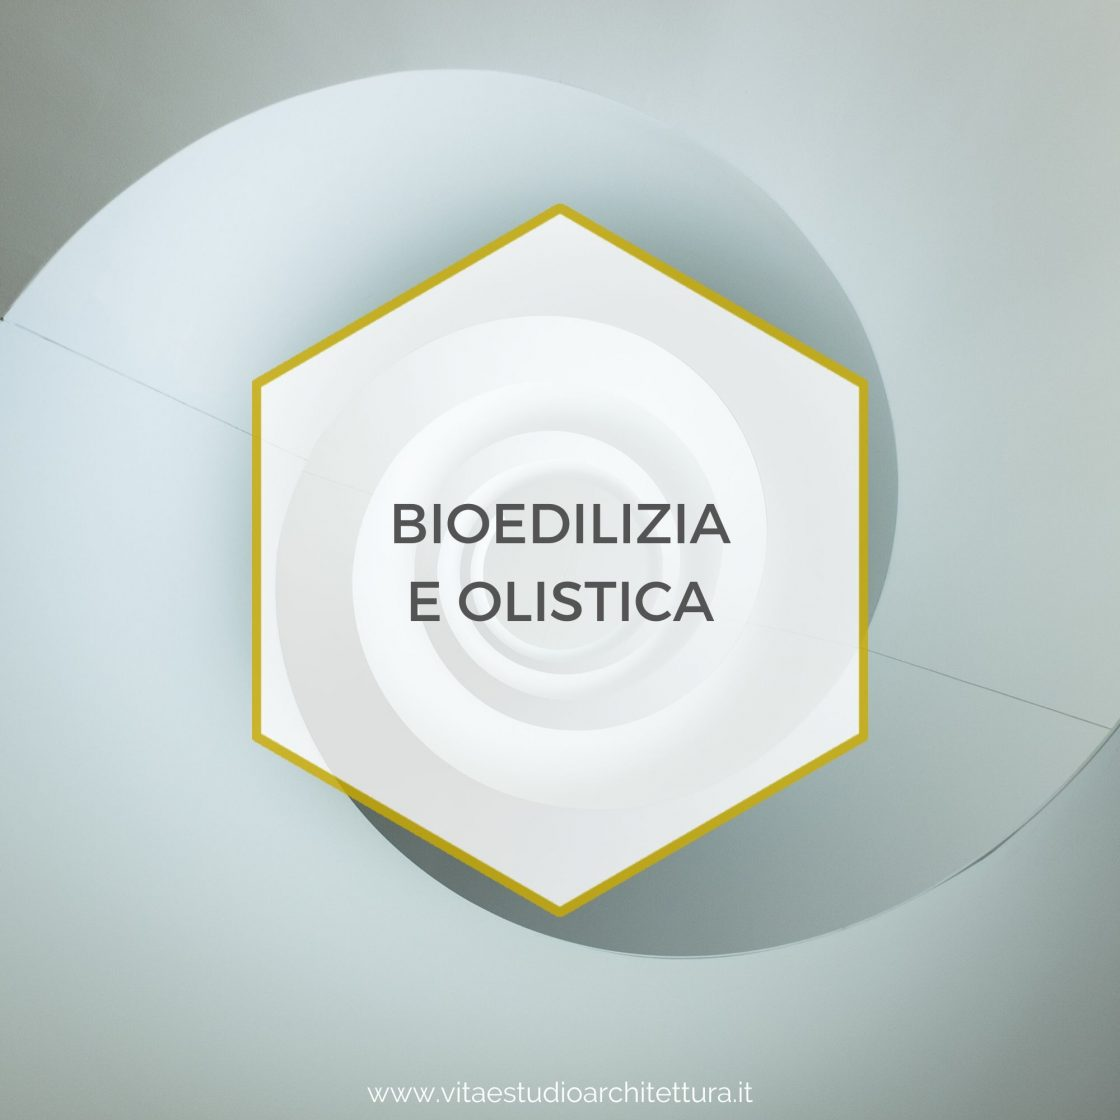 Bioedilizia e olistica